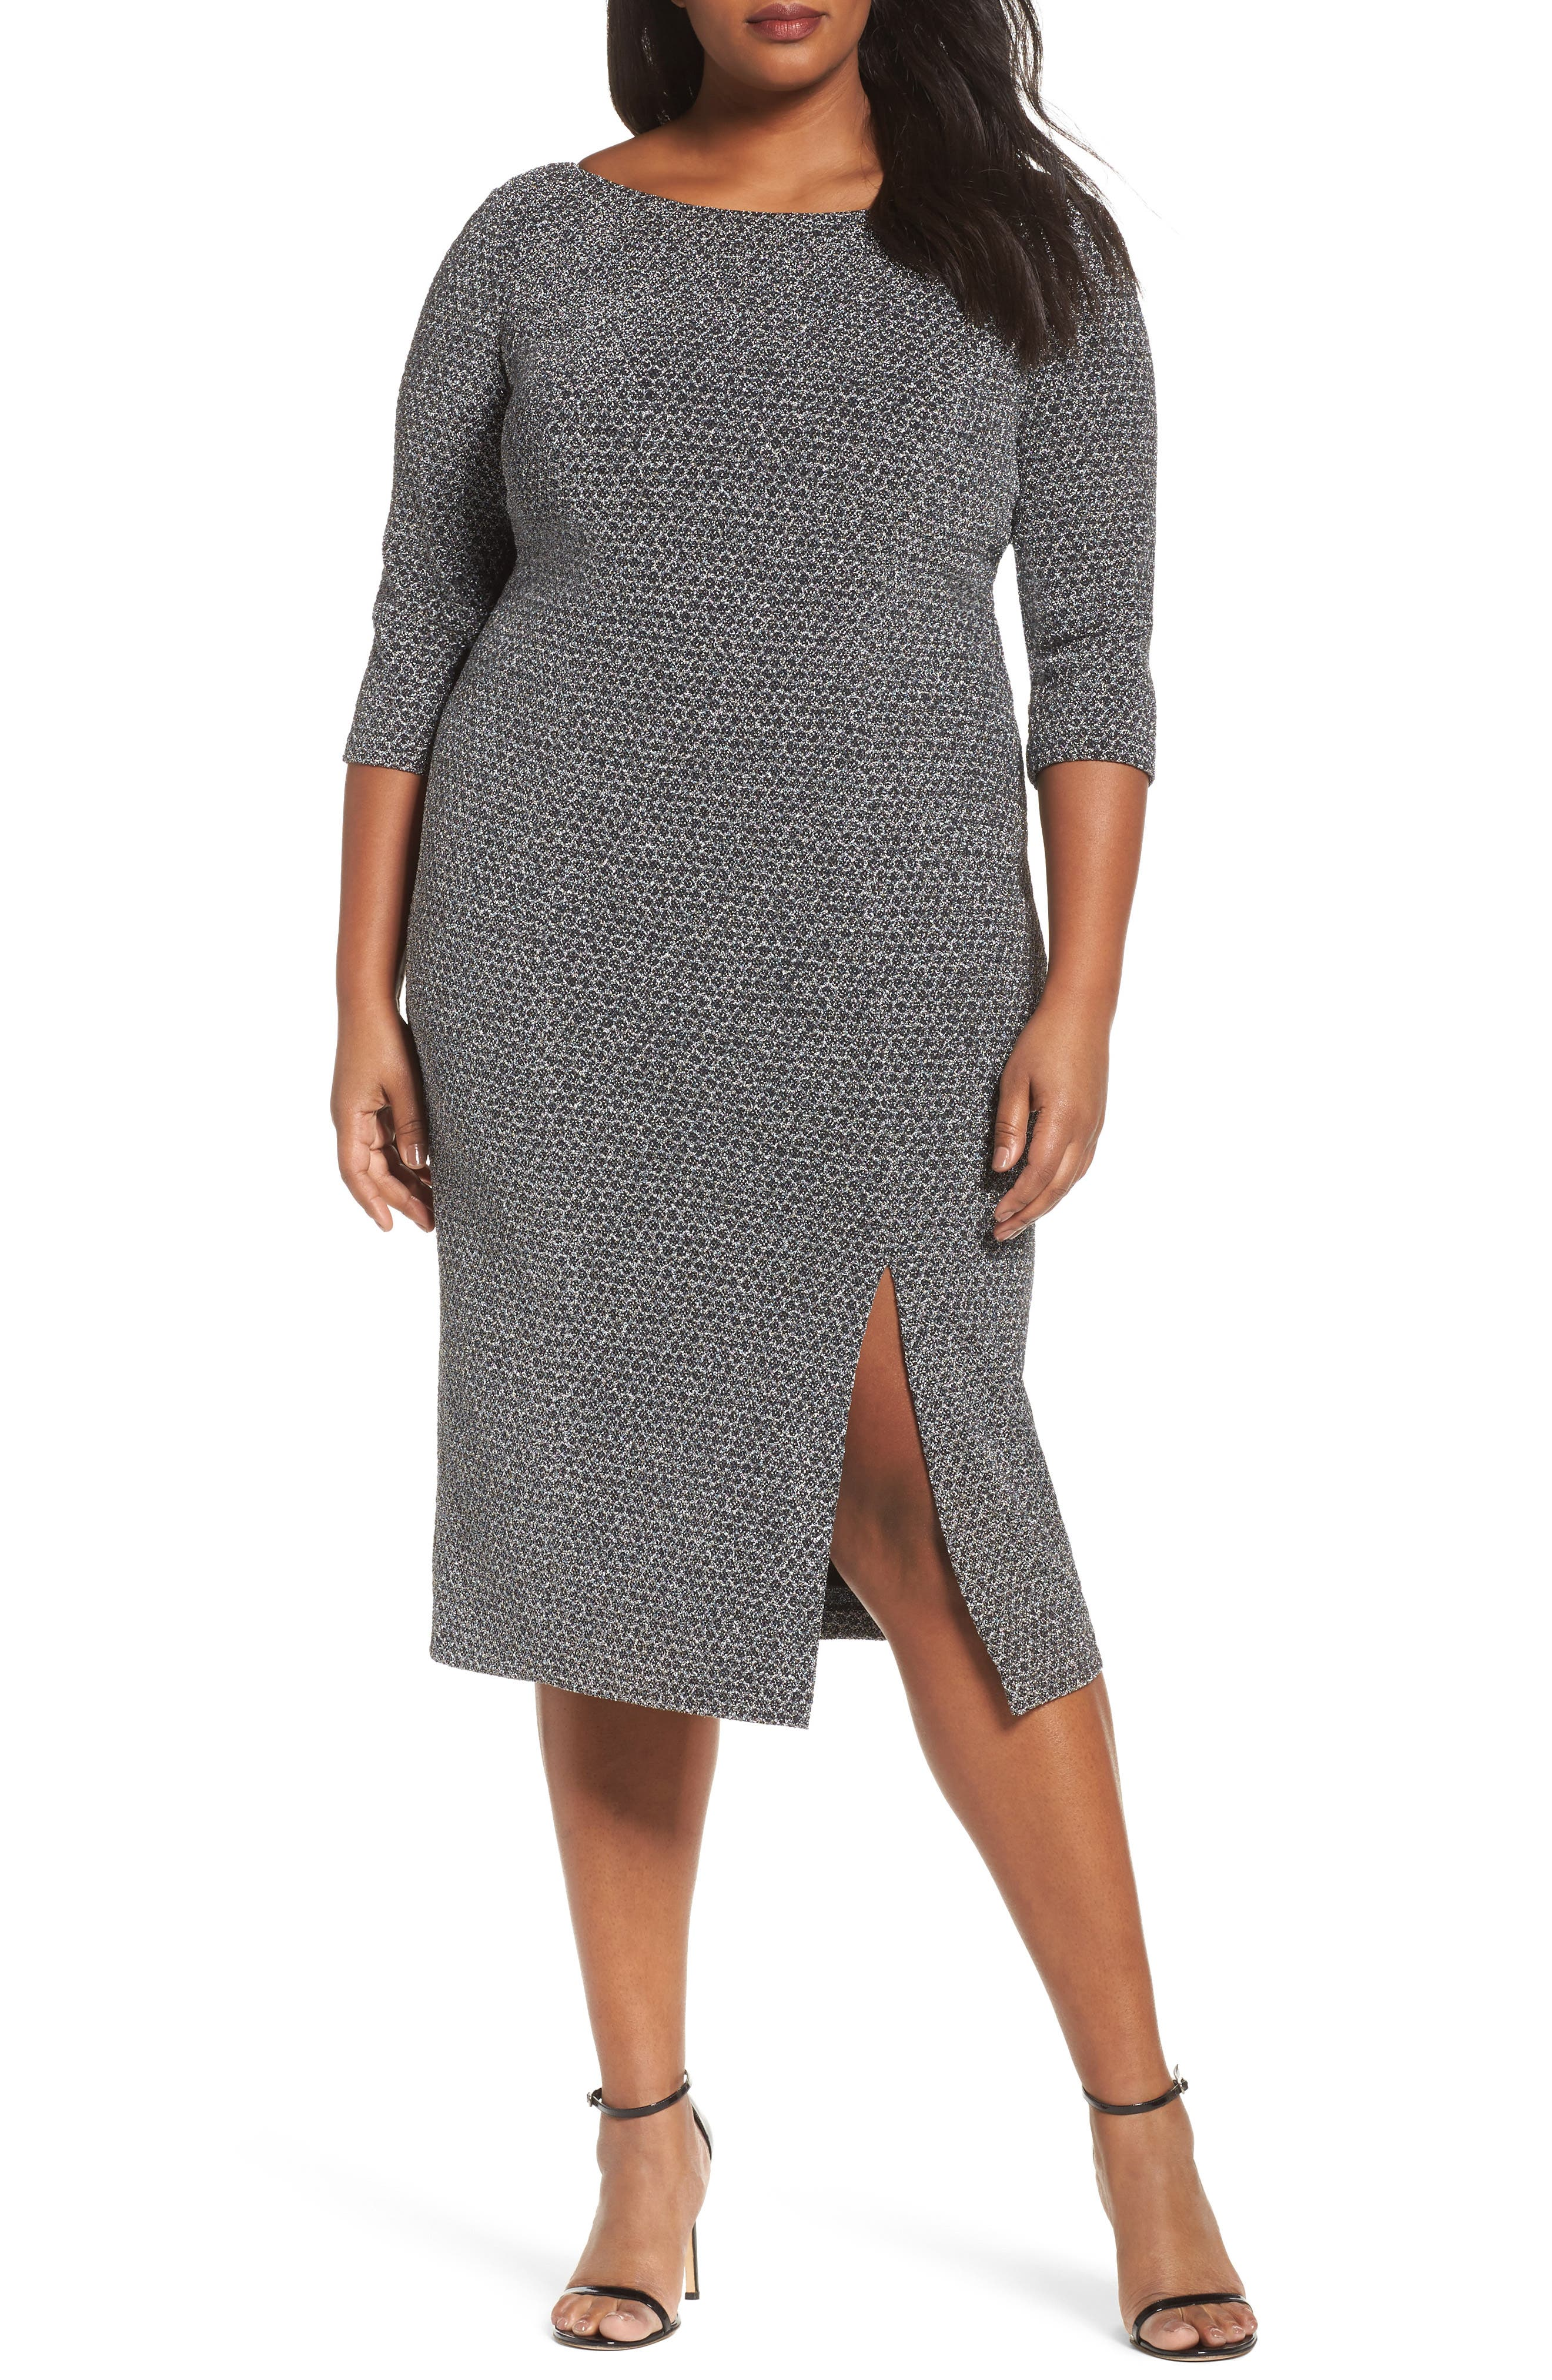 Adrianna Papell Glitter Knit Sheath Dress (Plus Size)